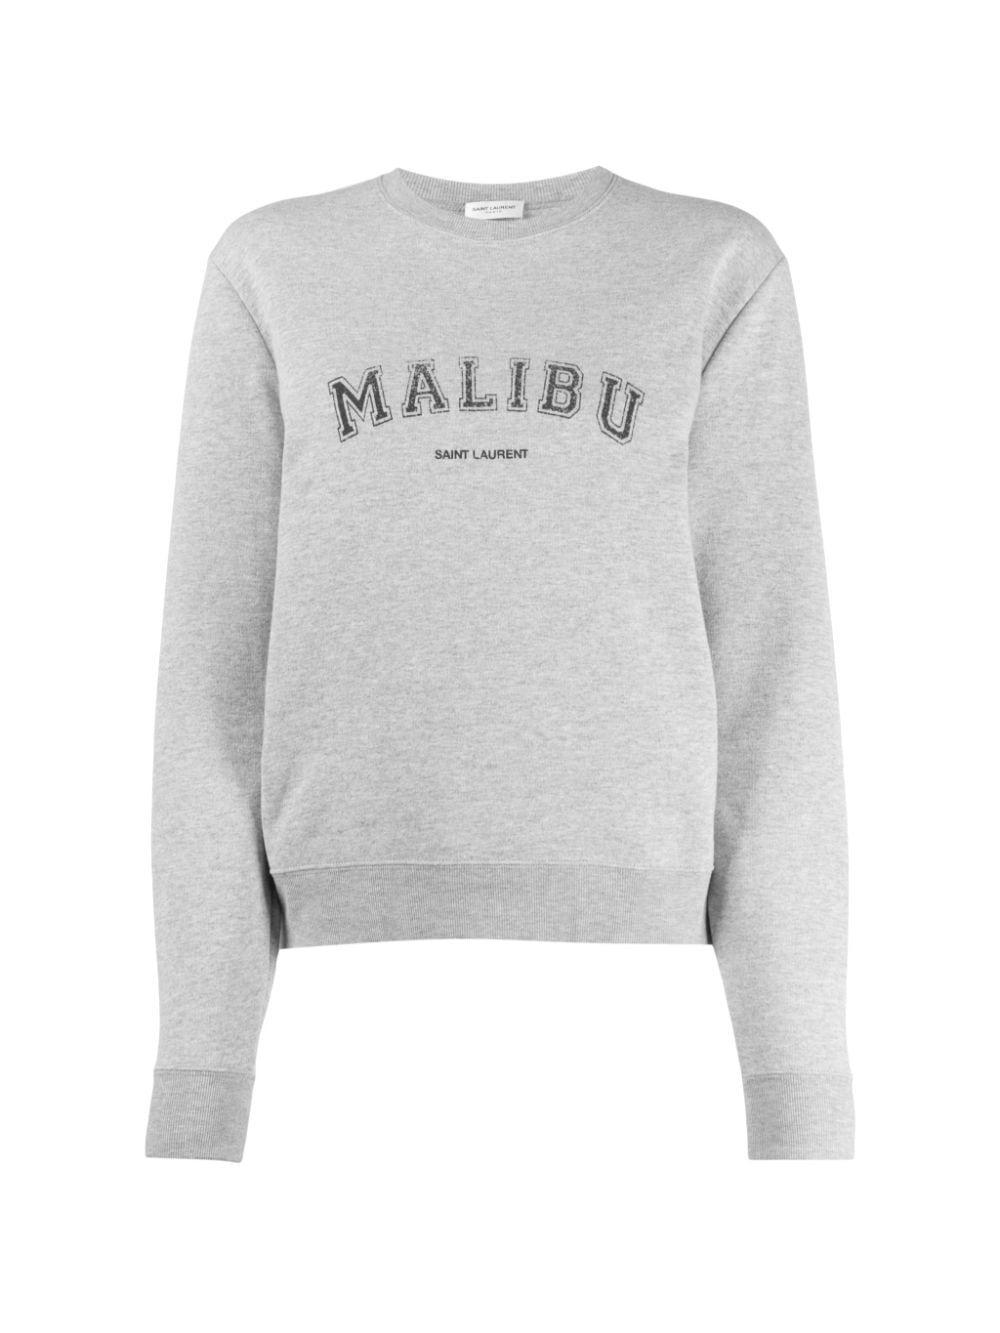 Saint Laurent Malibu Crewneck Sweatshirt Saintlaurent Cloth Crew Neck Sweatshirt Sweatshirts Saint Laurent [ 1333 x 1000 Pixel ]